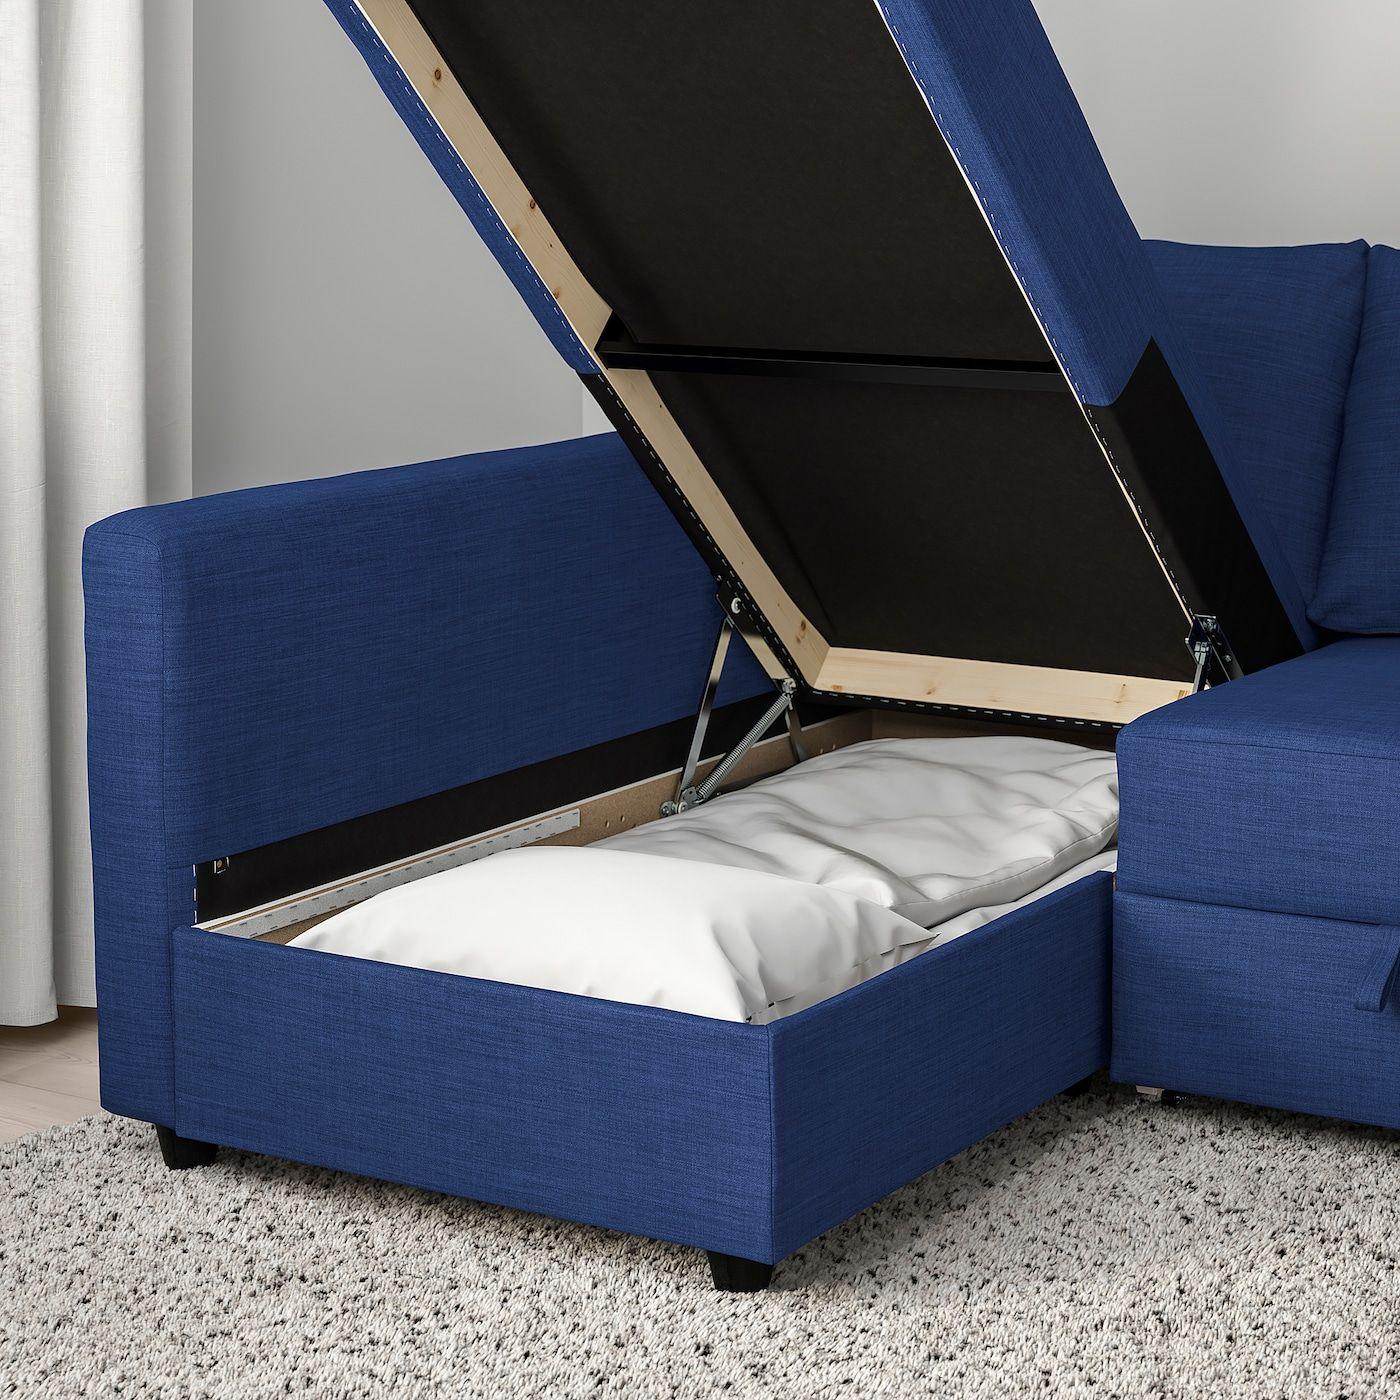 Friheten Corner Sofa Bed With Storage Skiftebo Blue Ikea Sofa Bed With Storage Corner Sofa Bed With Storage Bed Storage